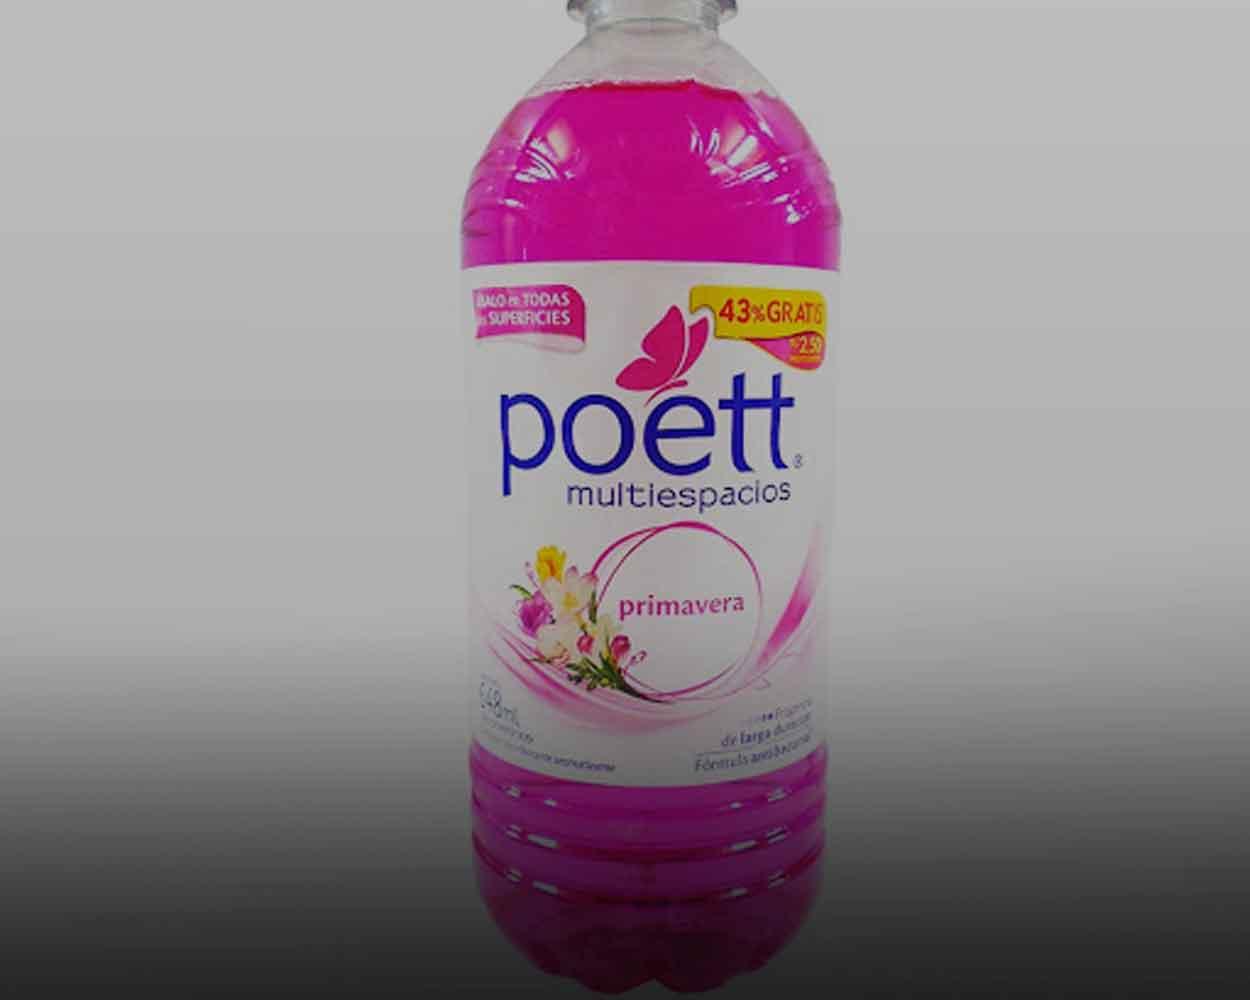 poett desinfectante peru